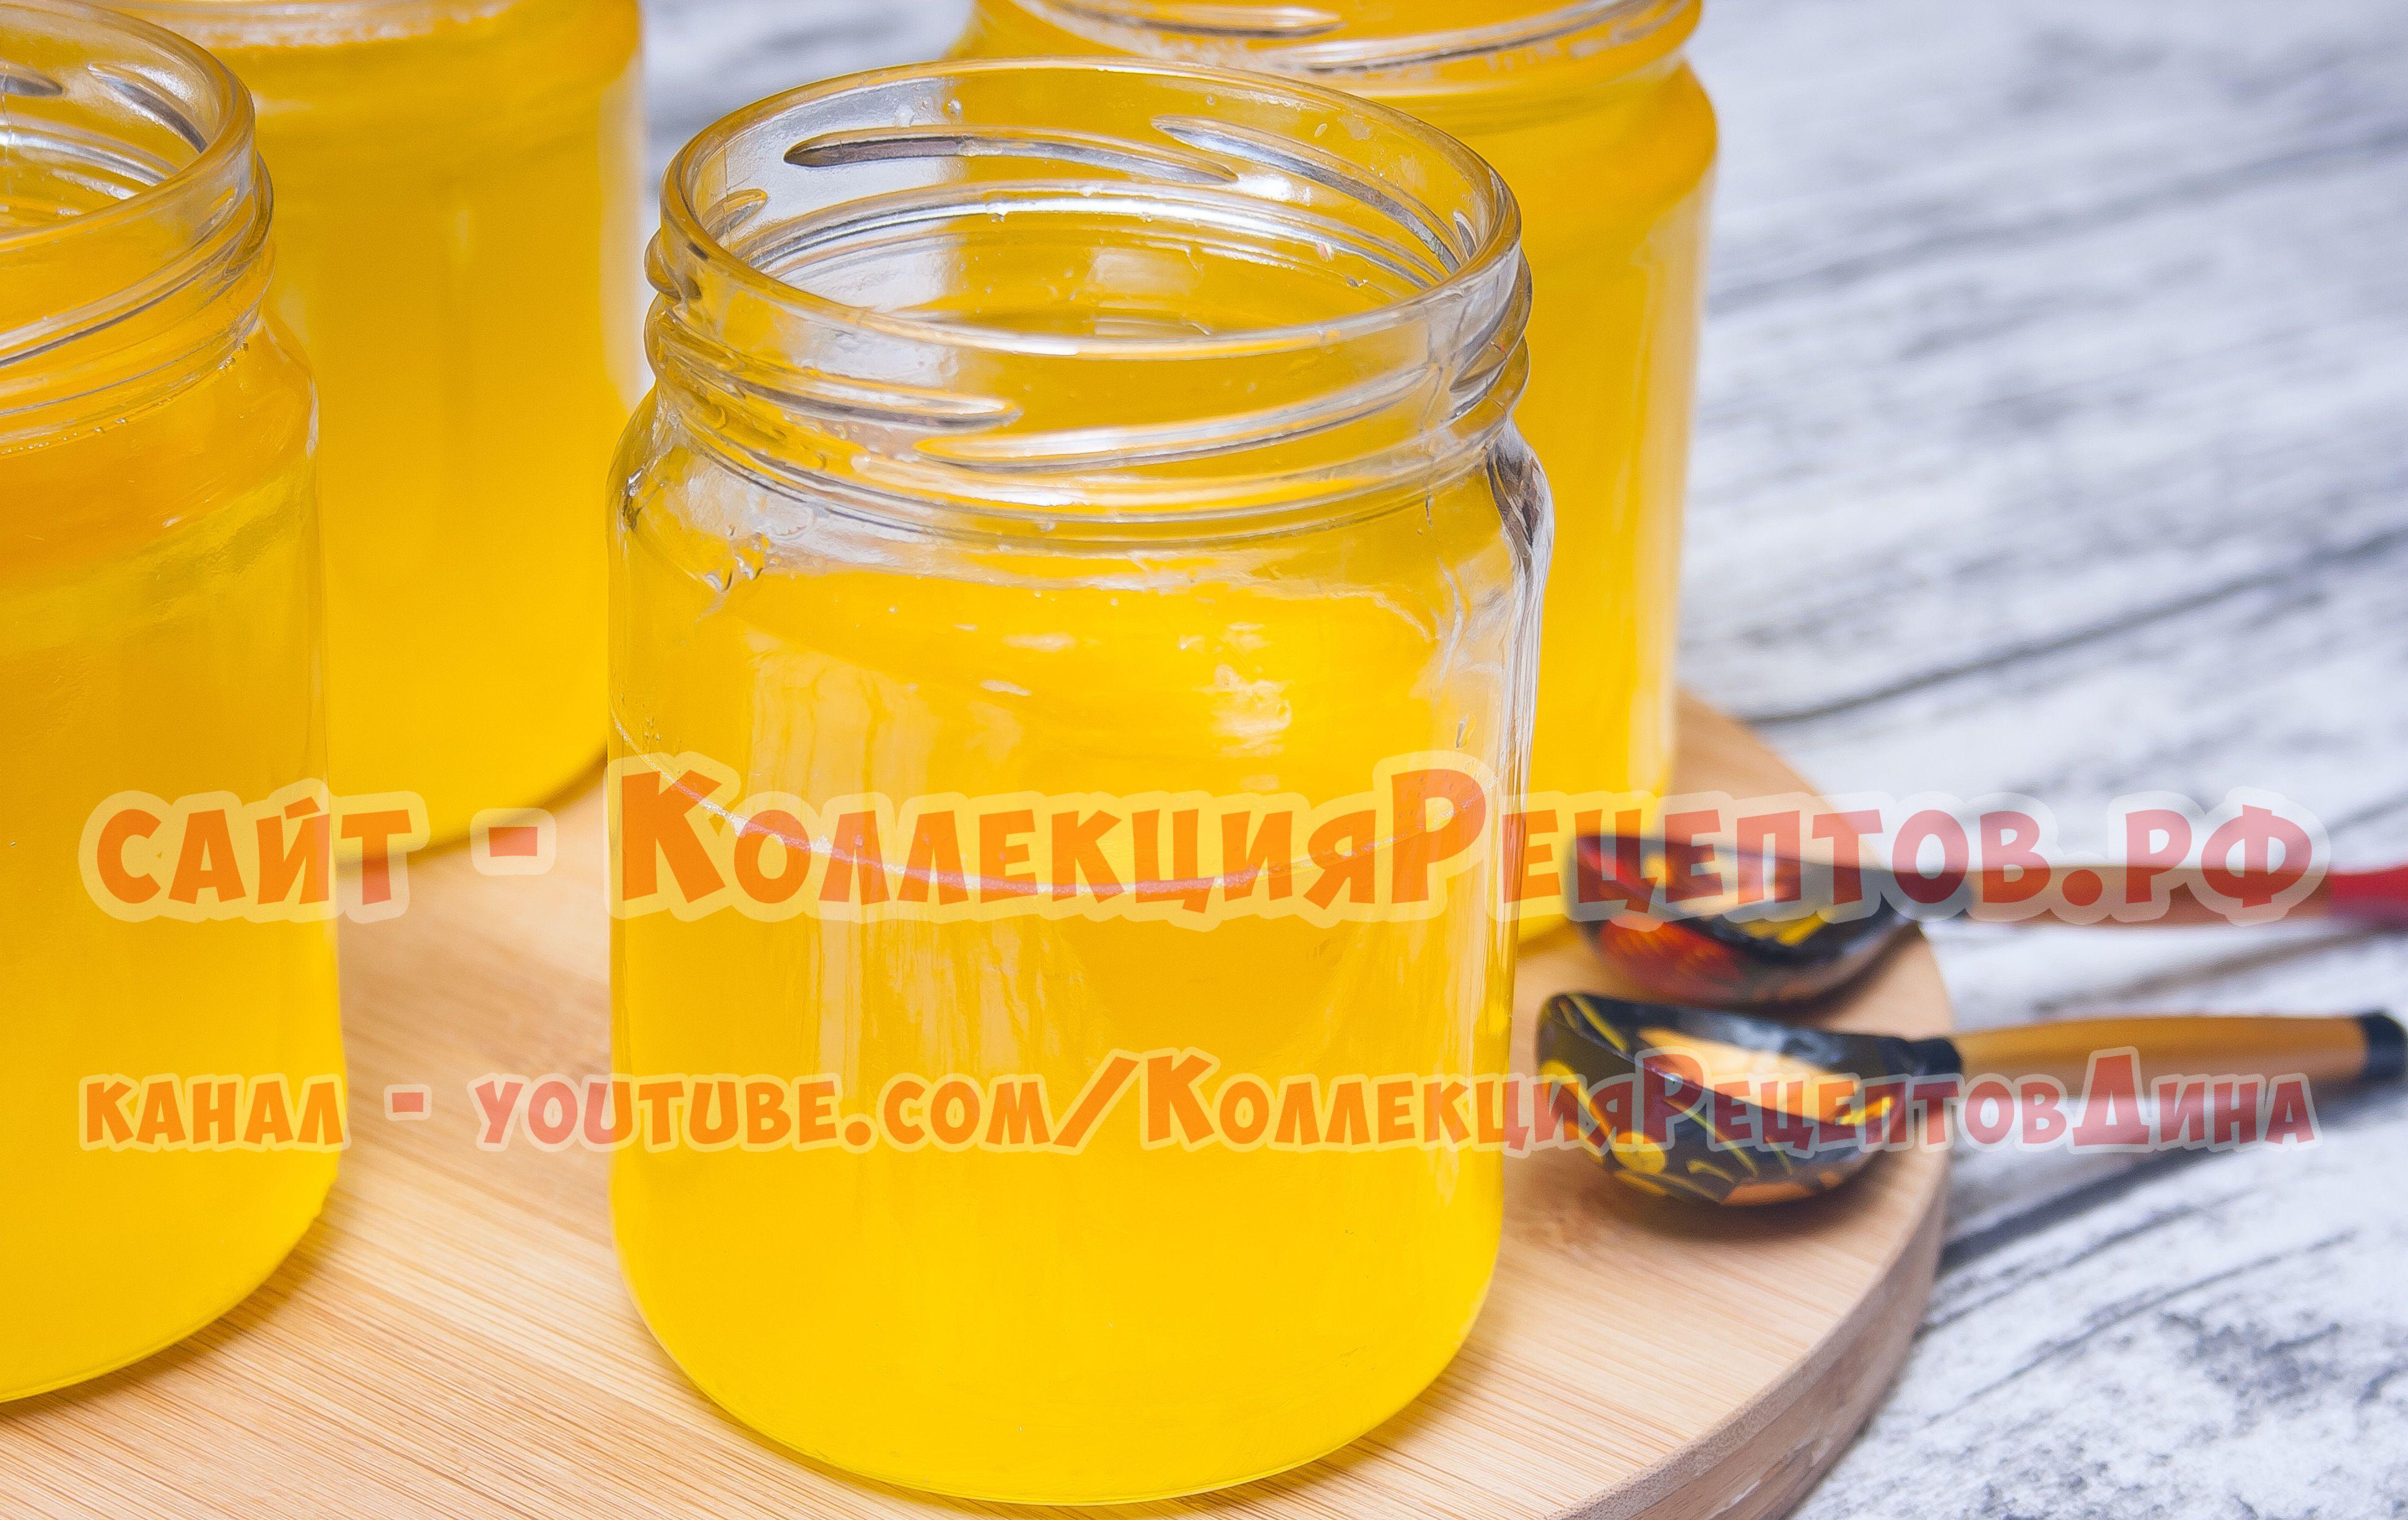 Топлёное масло в домашних условиях фото 568